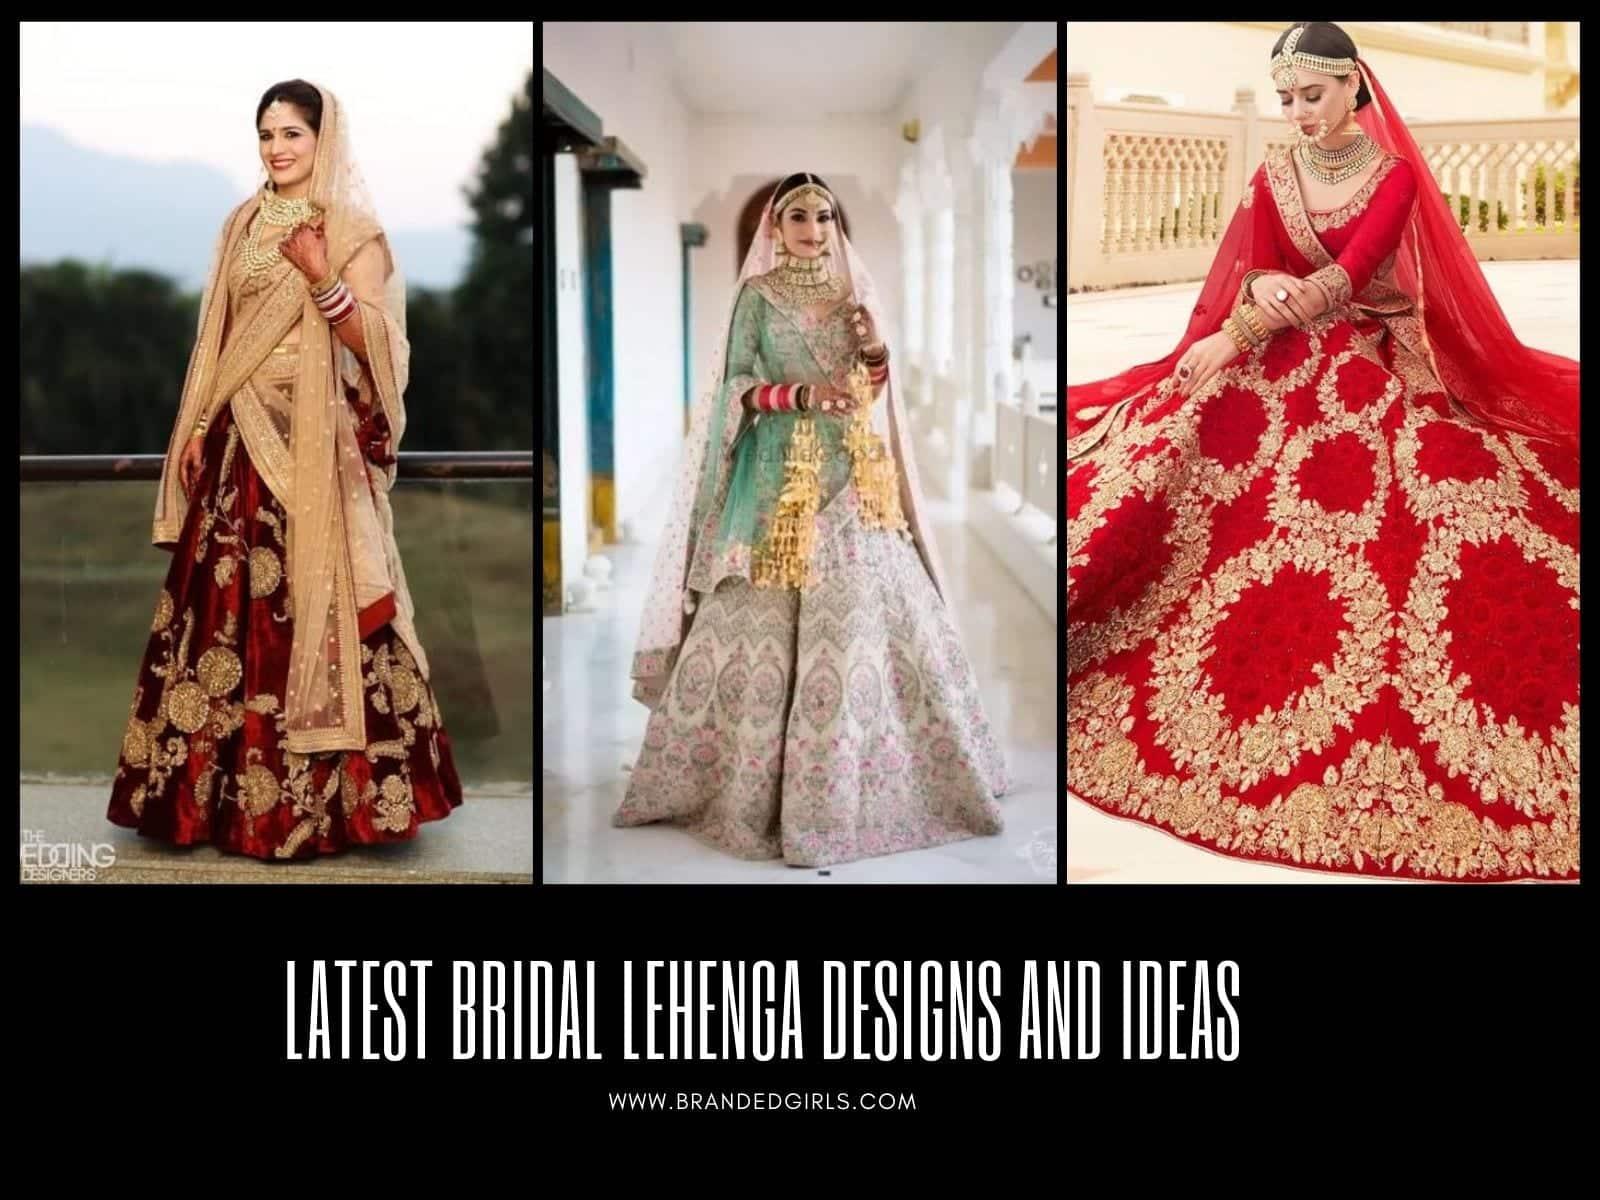 Latest-Bridal-Lehenga-Designs-and-Ideas 20 Latest Bridal Lehenga Designs And Styles To Try This Year